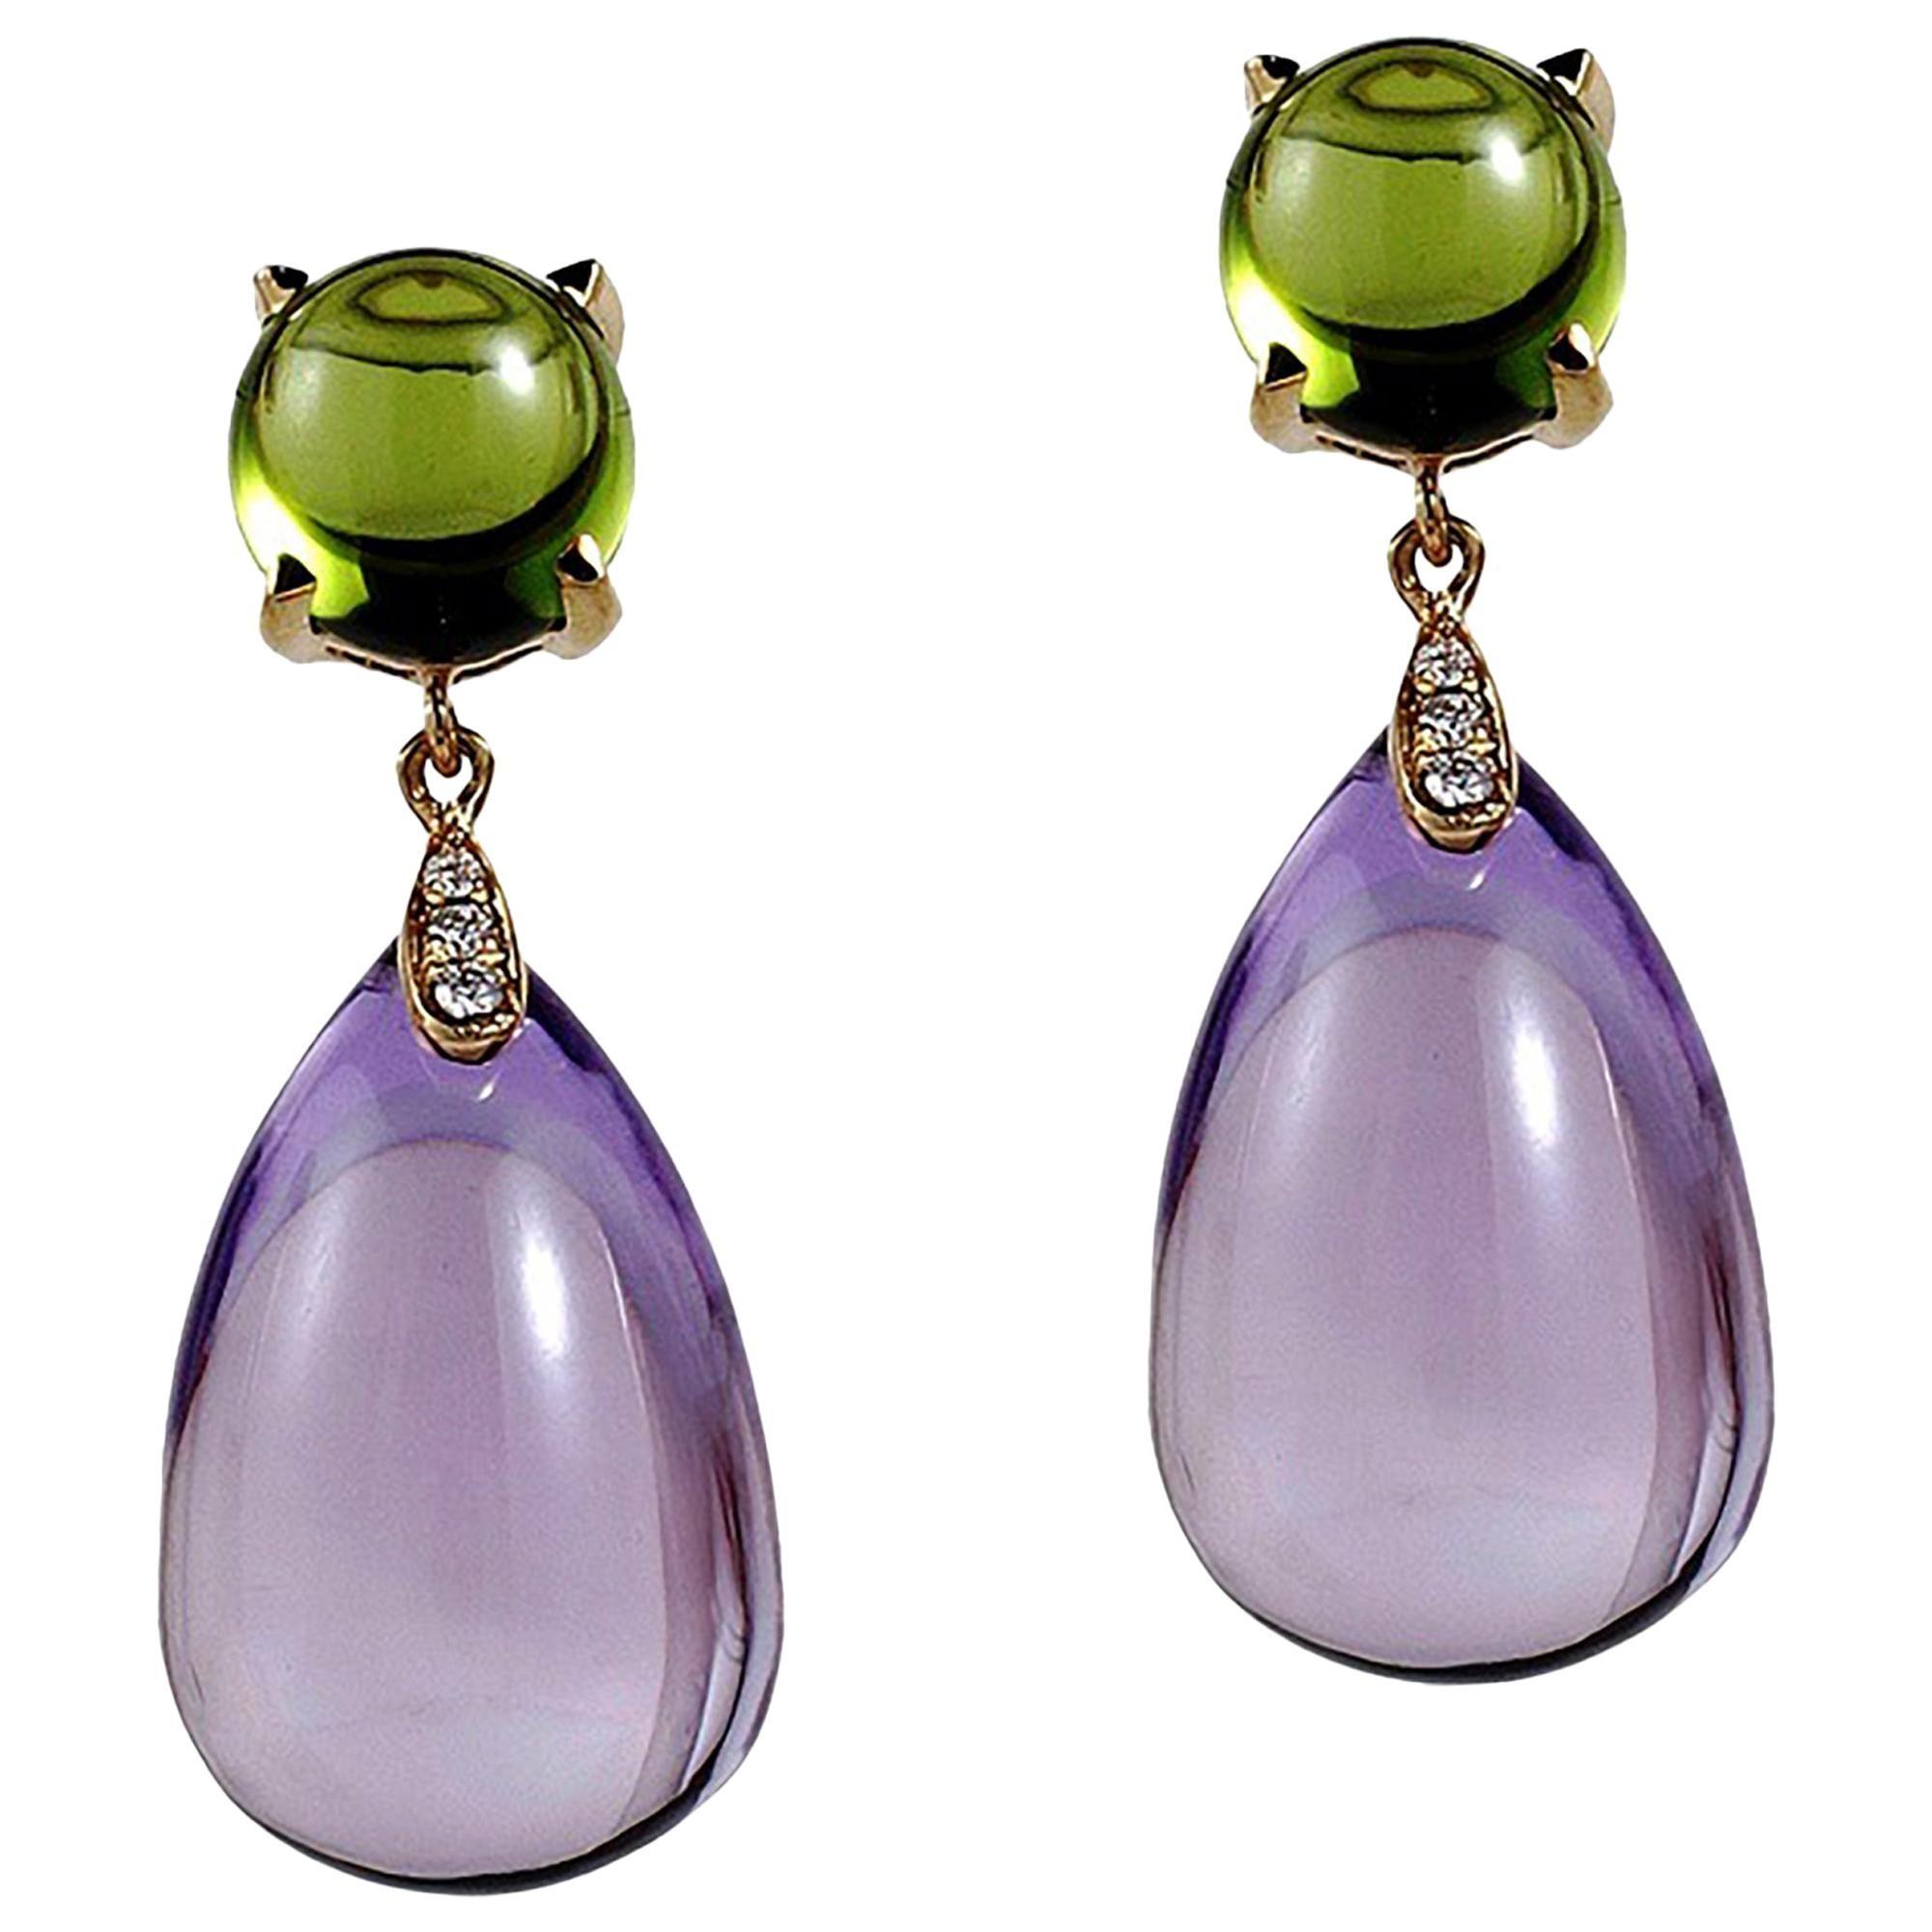 Goshwara Amethyst Drop With Peridot Cabochon And Diamond Earrings